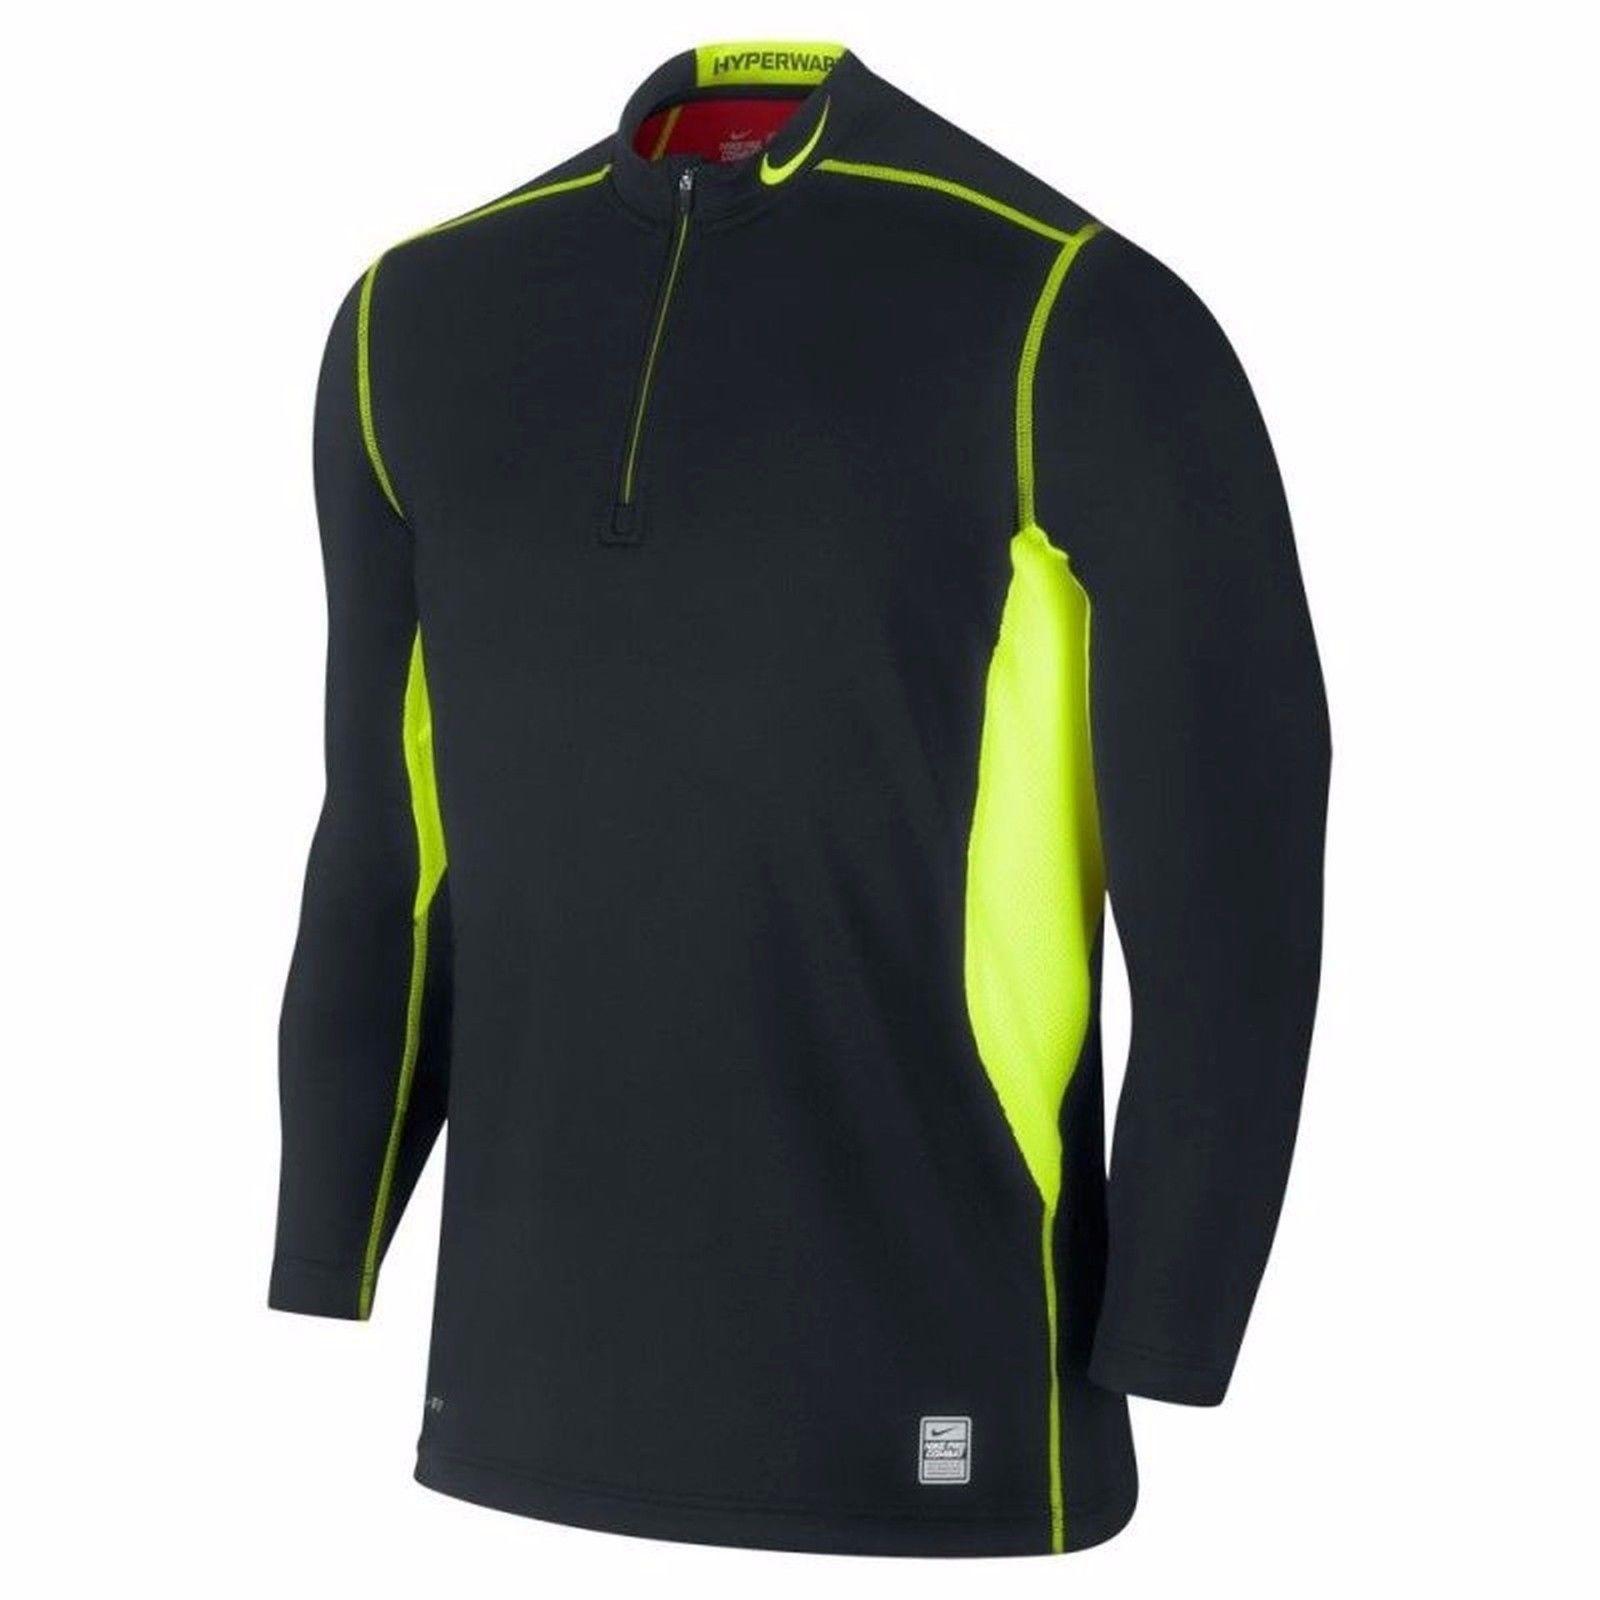 Nike pro combat hyperwarm drifit max quarterzip mens